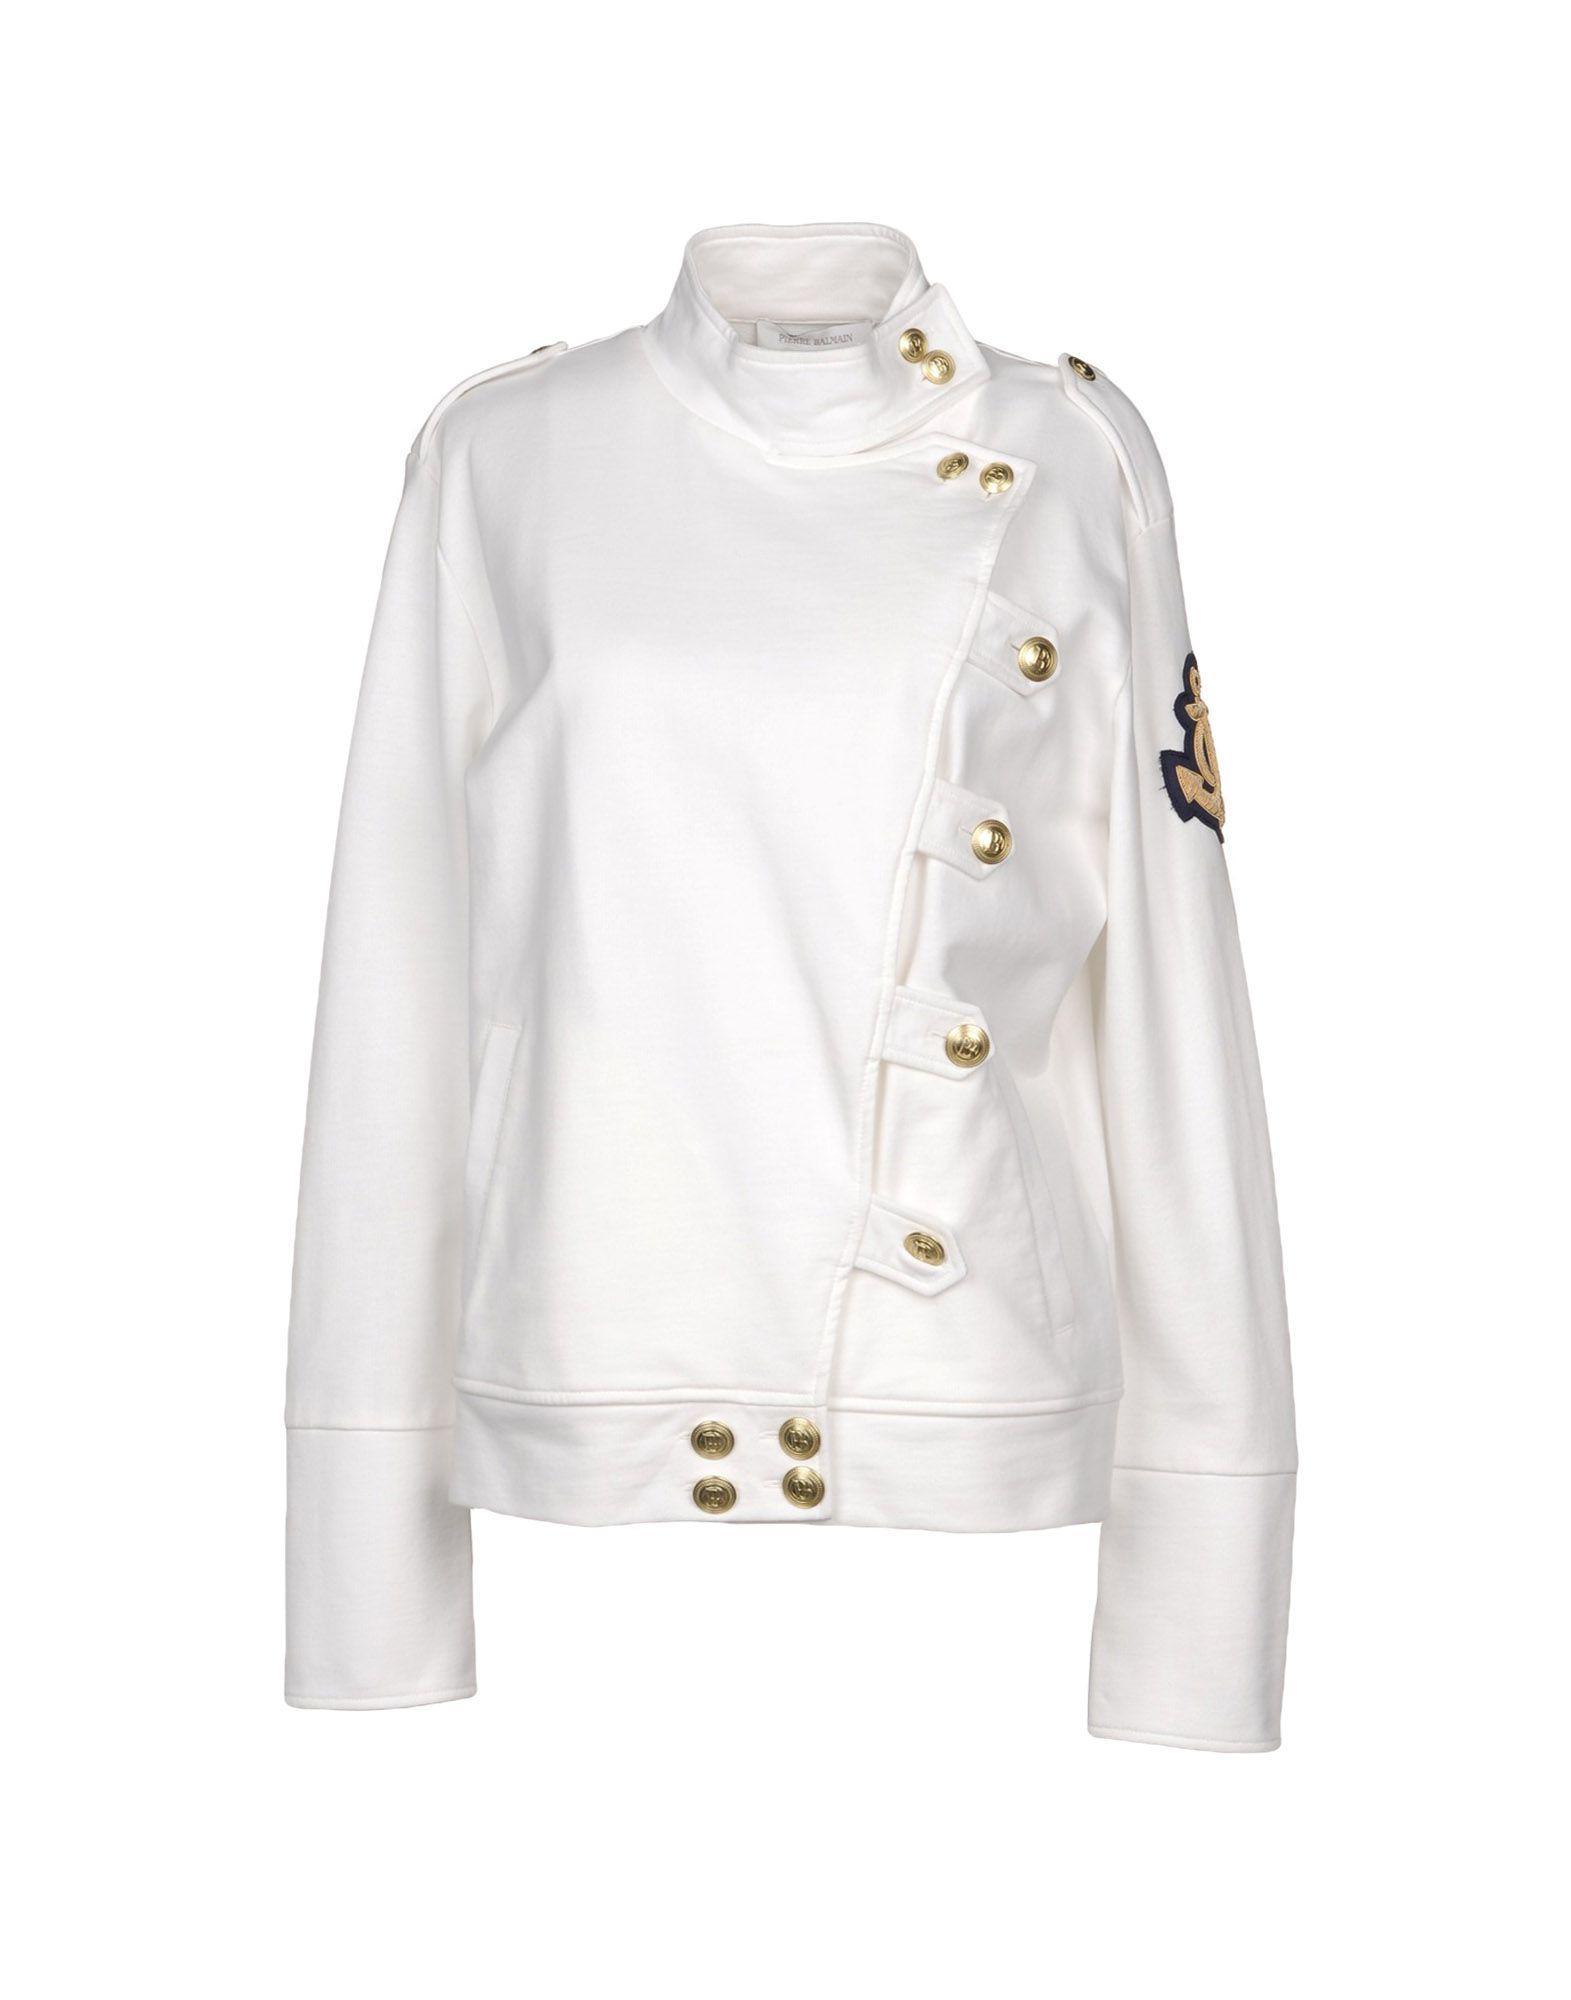 Pierre Balmain Sweatshirts In White